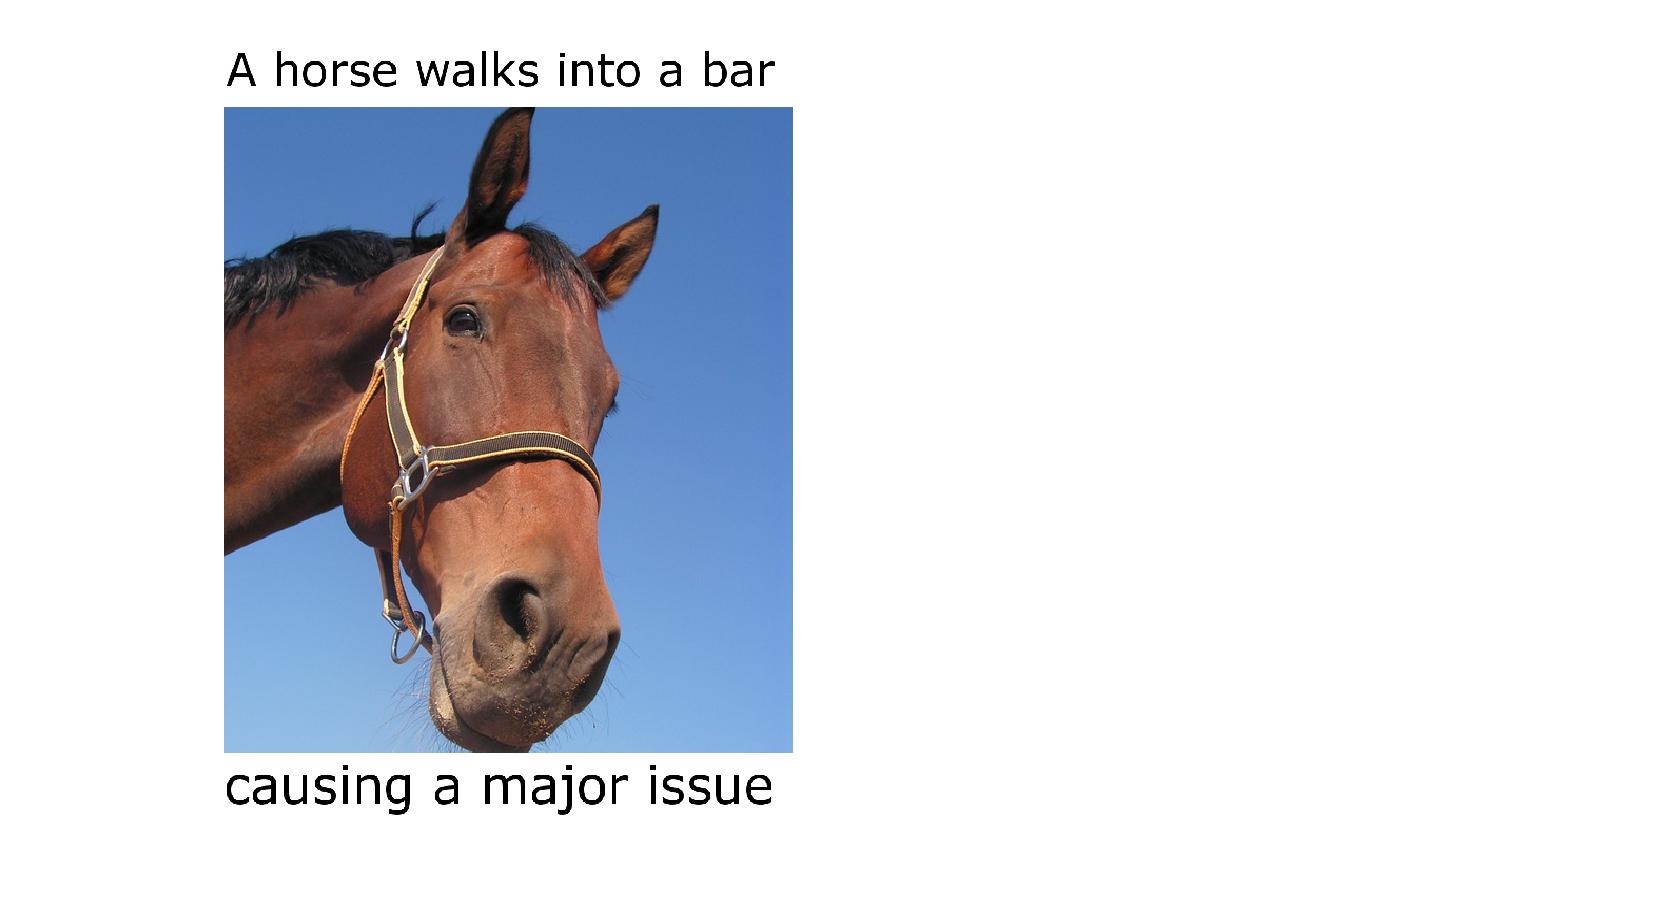 Horse walks into bar